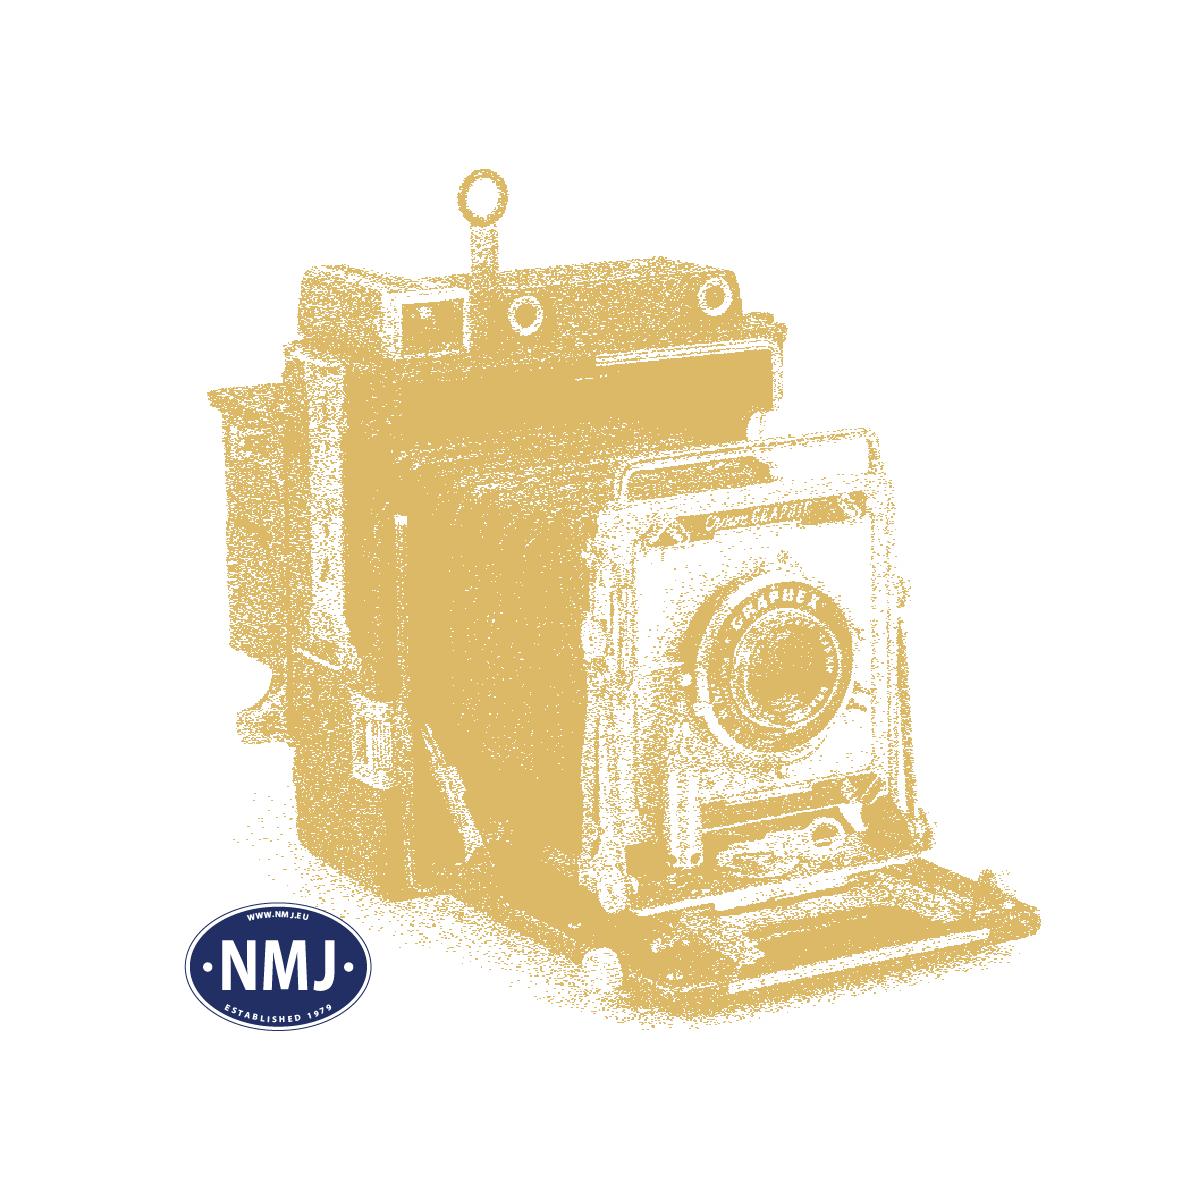 NMJT131.302 - NMJ Topline NSB B3-2 Type 3 25517, rot